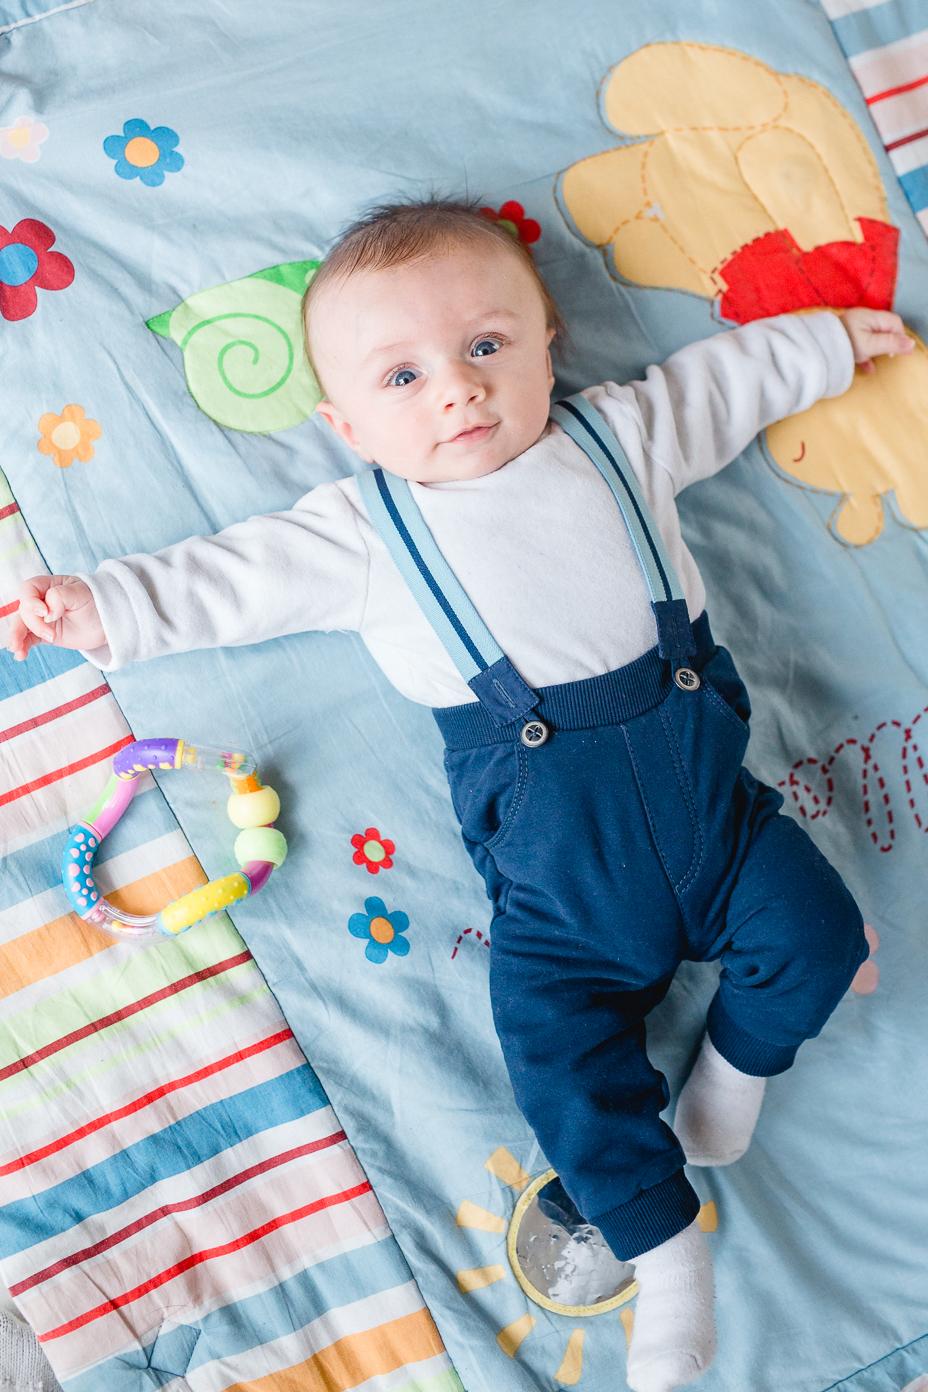 Babyfotografie-Kassel-2015-Inka Englisch Fotografie-Babyportraits-Babyshooting-Homestory-NS_008